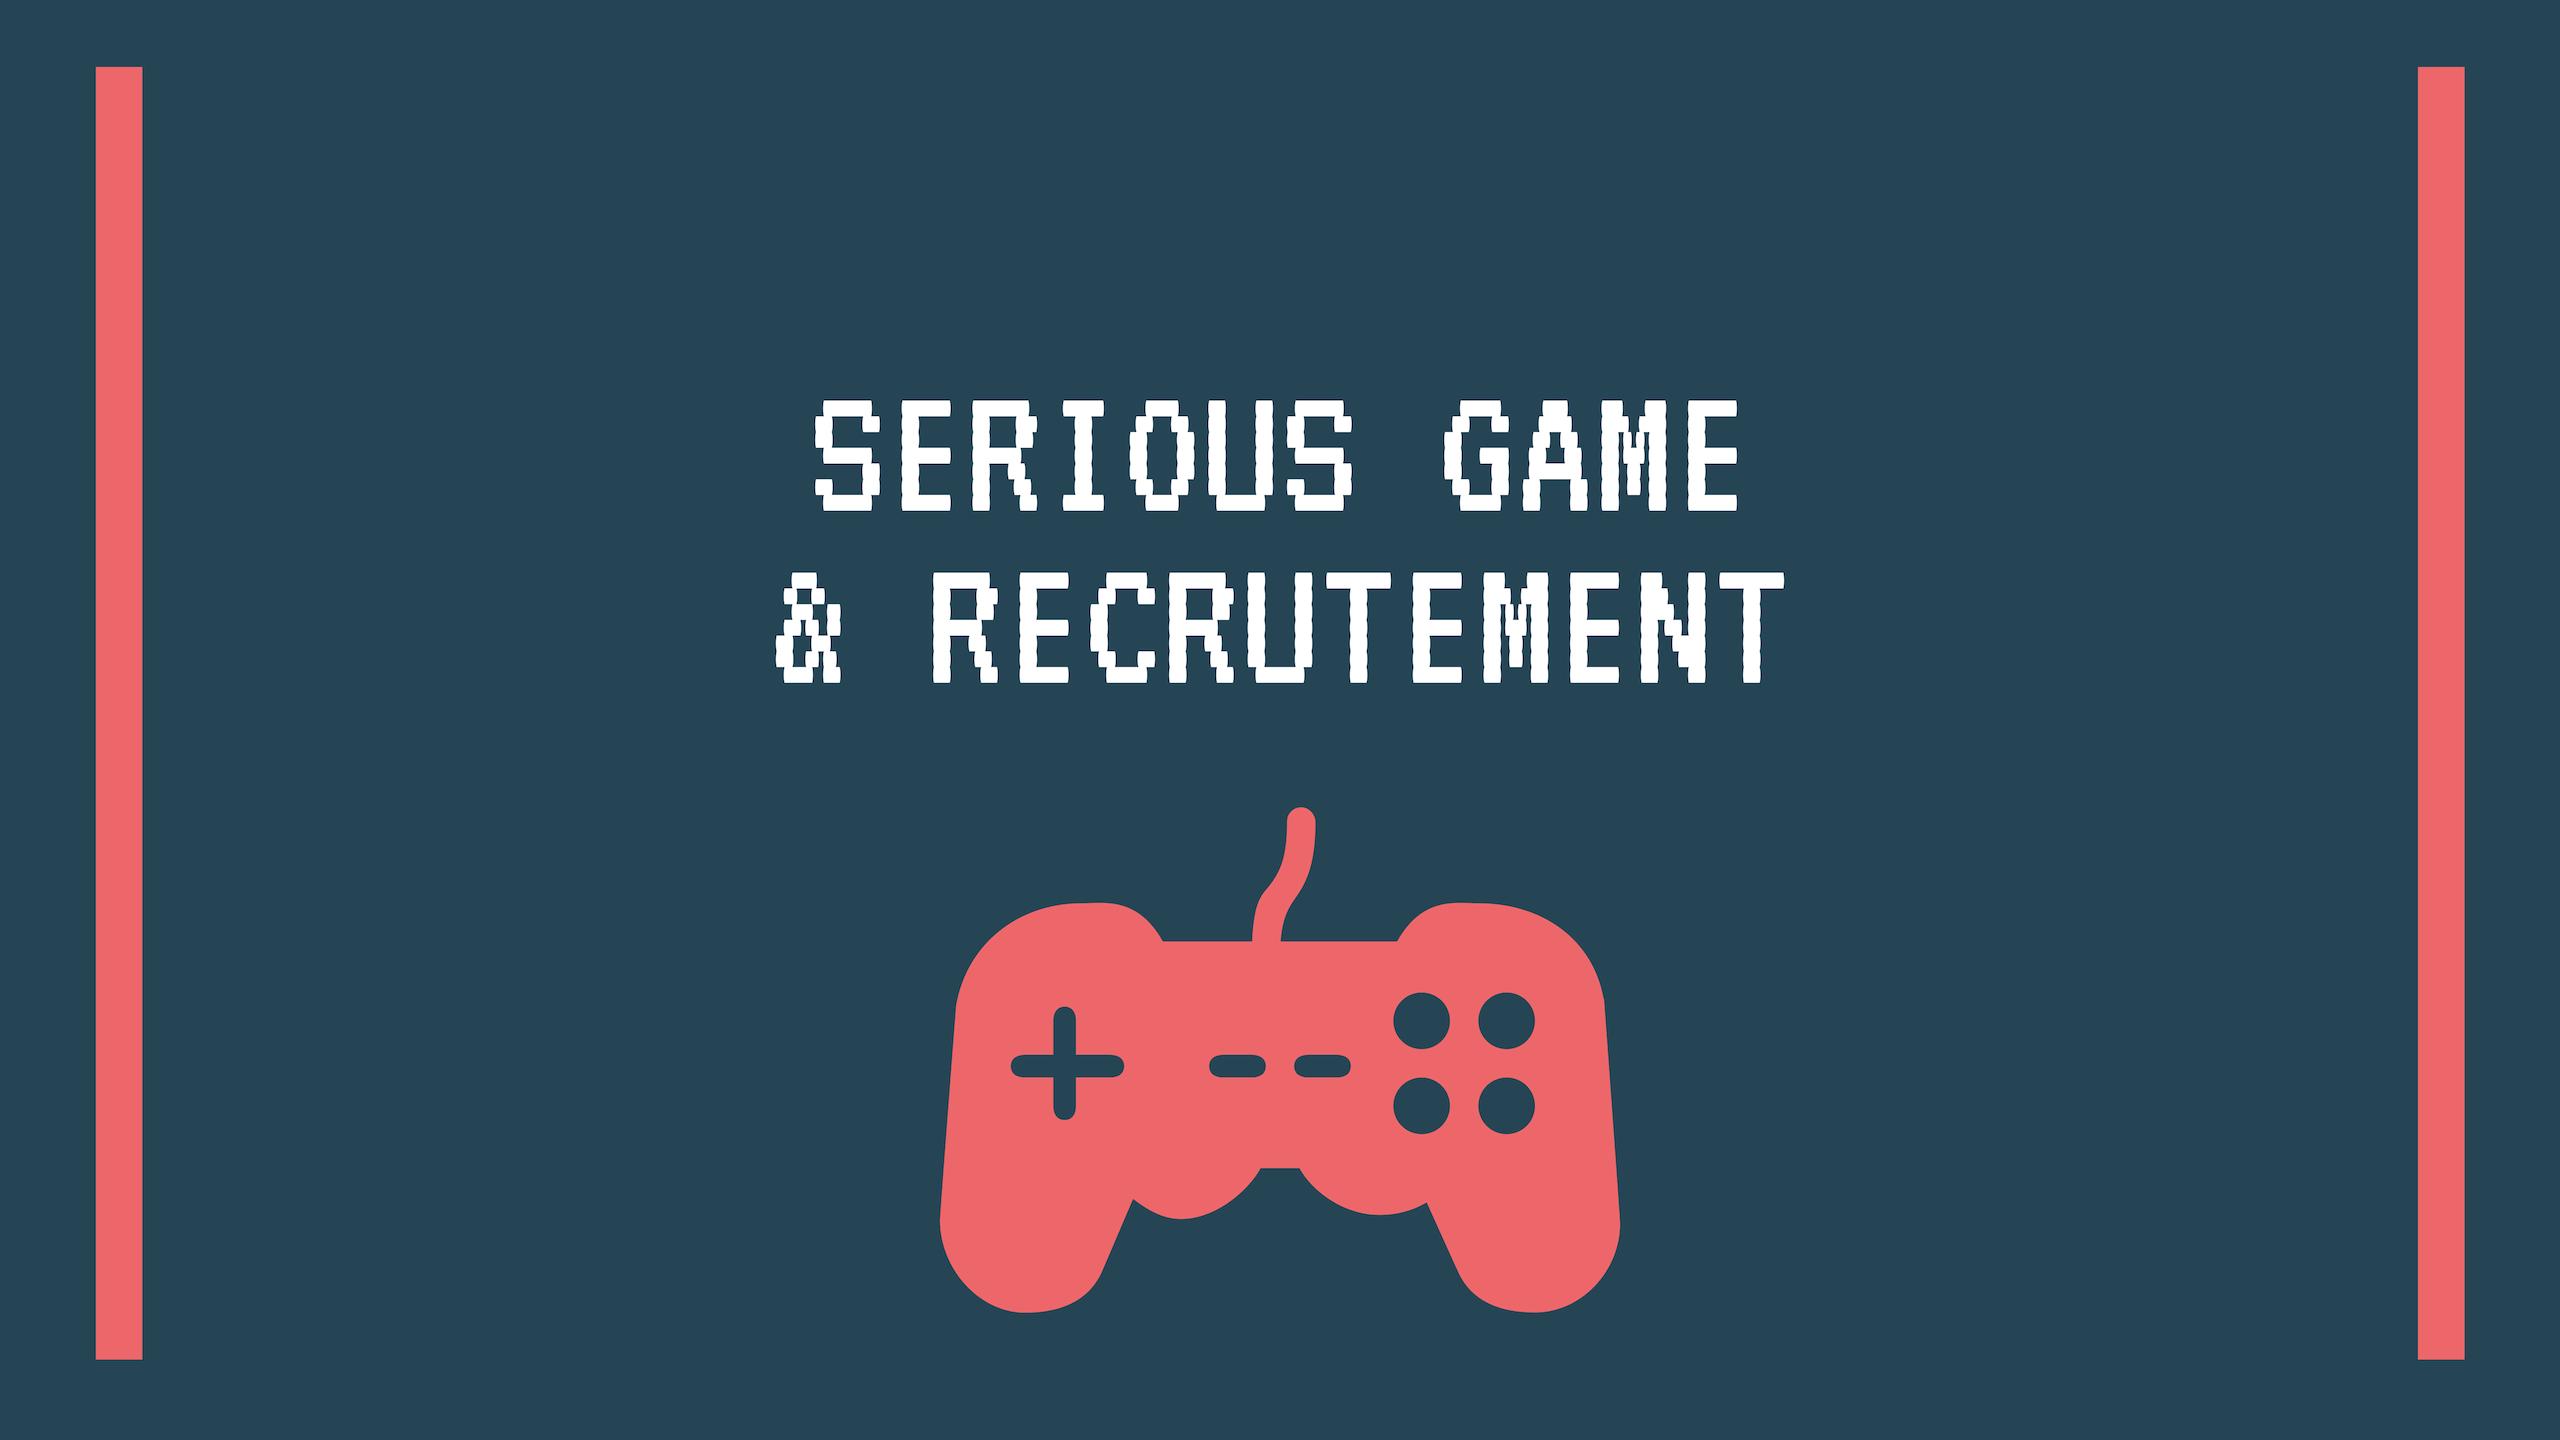 Serious Game